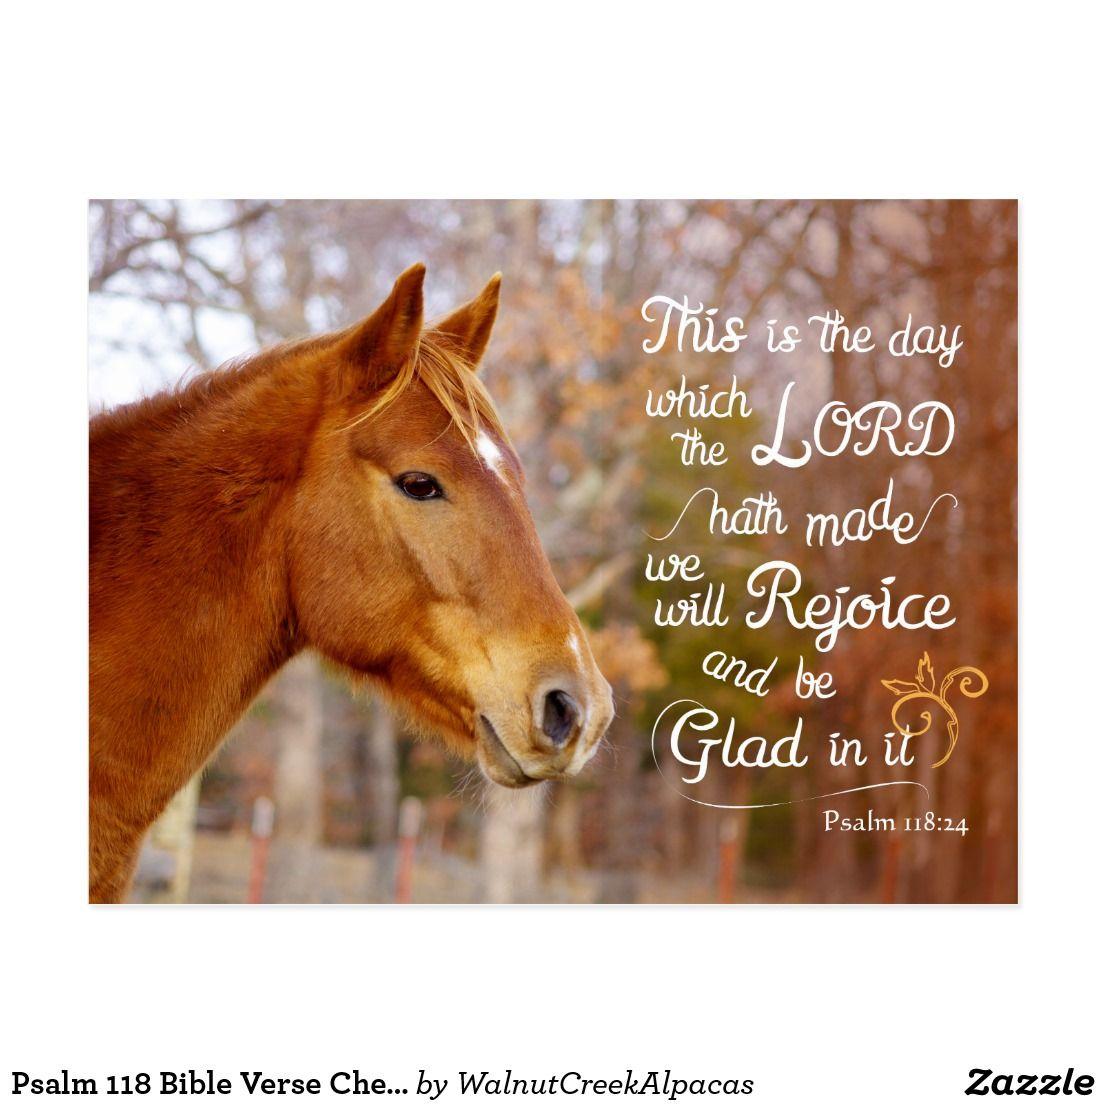 Psalm 118 Bible Verse Chestnut Horse Postcards ...